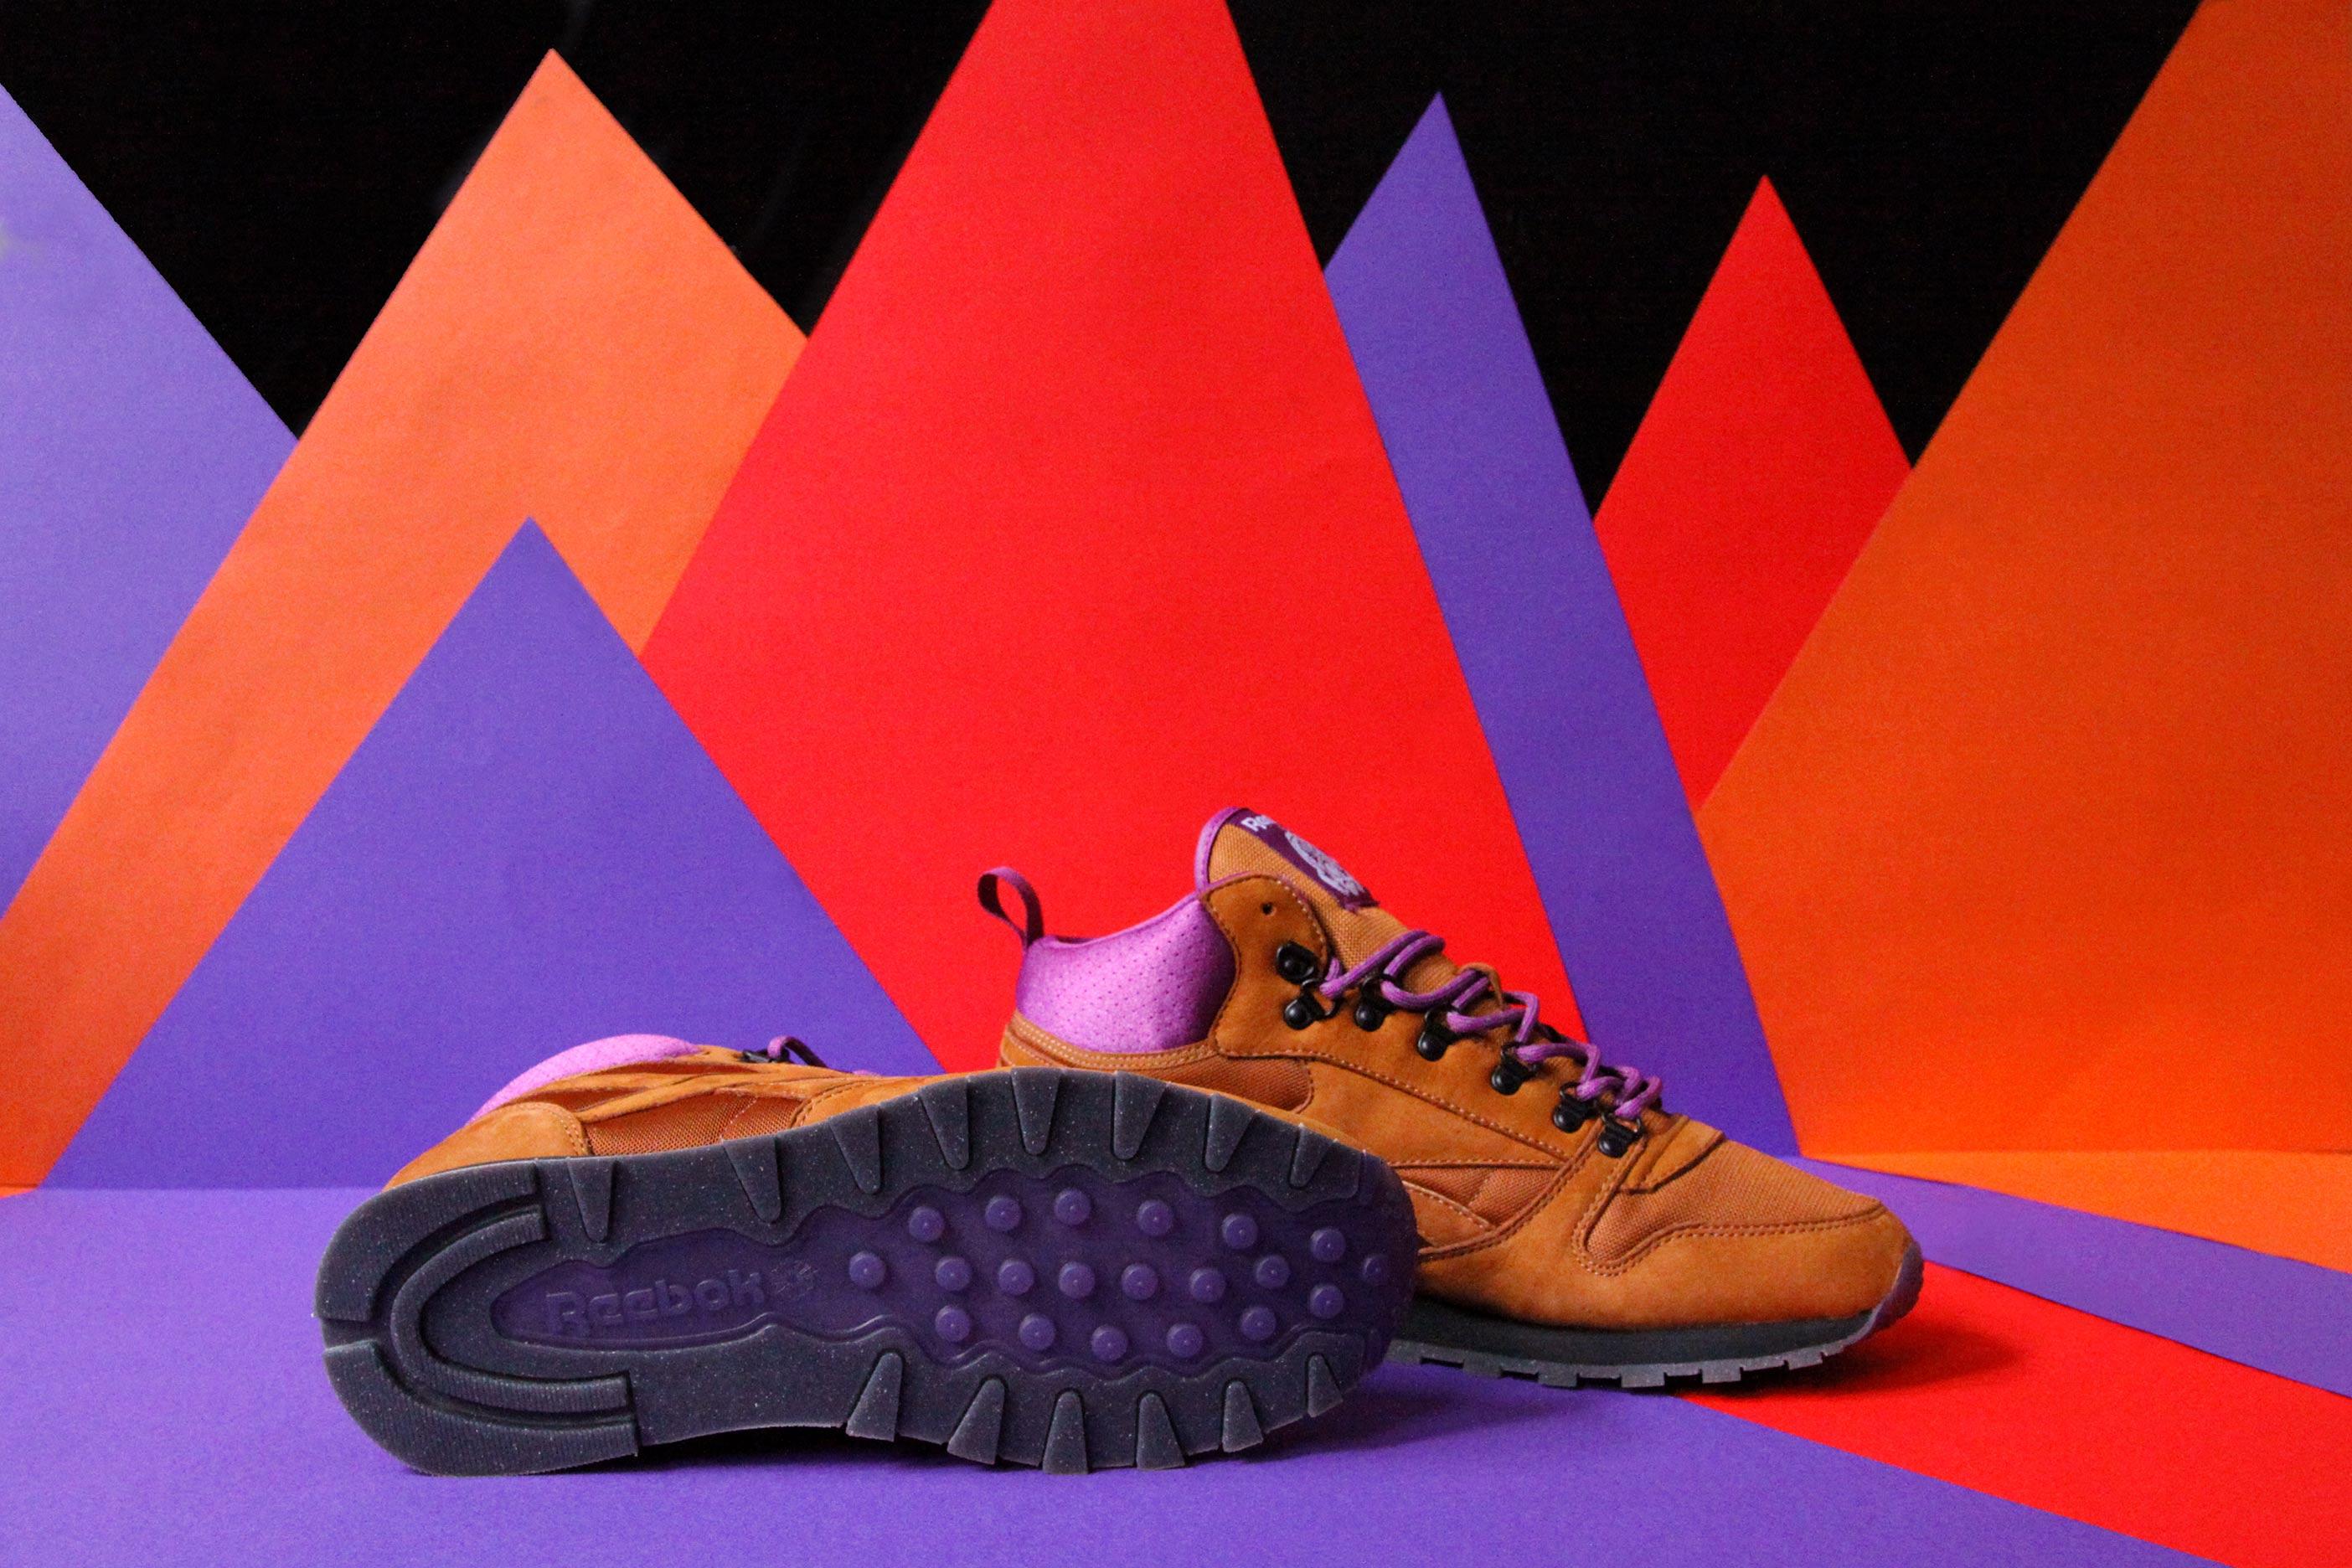 foot-patrol-reebok-classic-leather-mid-on-the-rocks-8